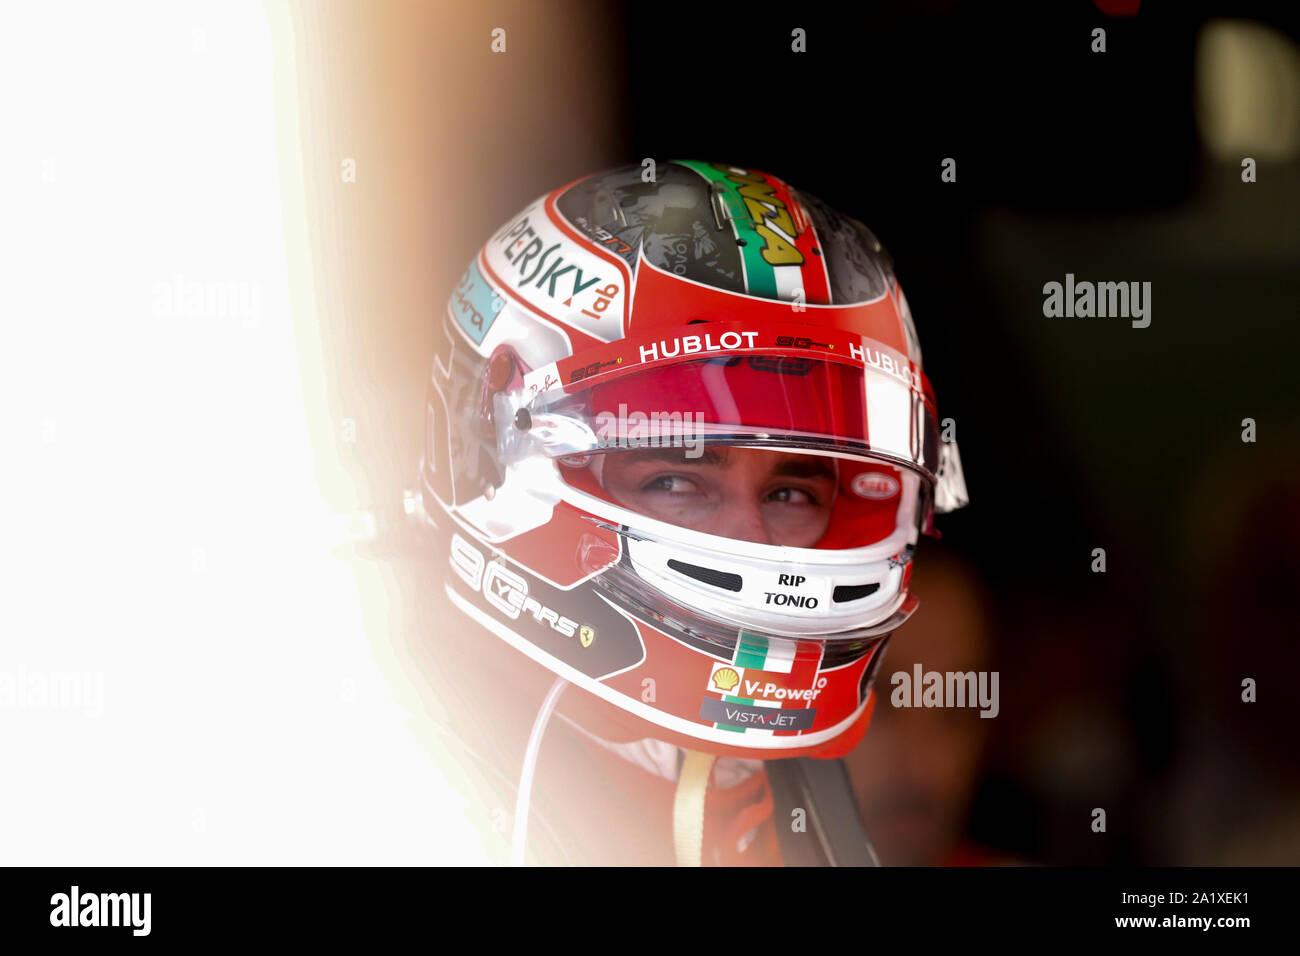 CHARLES LECLERC of Scuderia Ferrari at the Formula 1 Italian Grand Prix at Monza Eni Circuit in Monza, Italy. Stock Photo